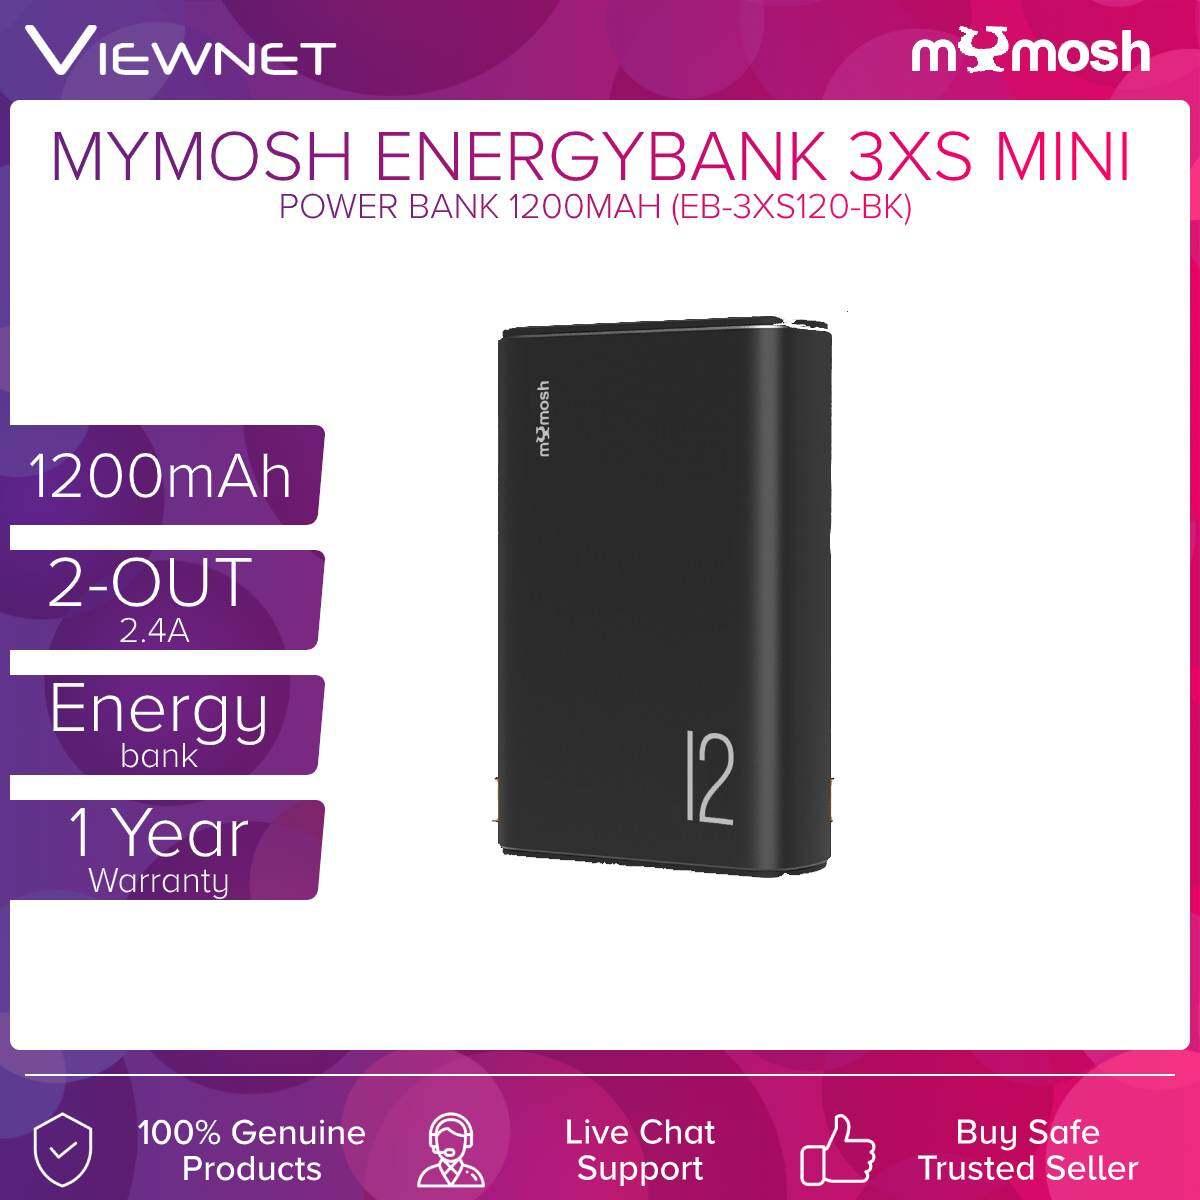 Mymosh 1200mAh Energybank 3XS Mini 2-Out 2.4A (EB-3XS120-BL) Navy Blue / (EB-3XS120-BK) Black